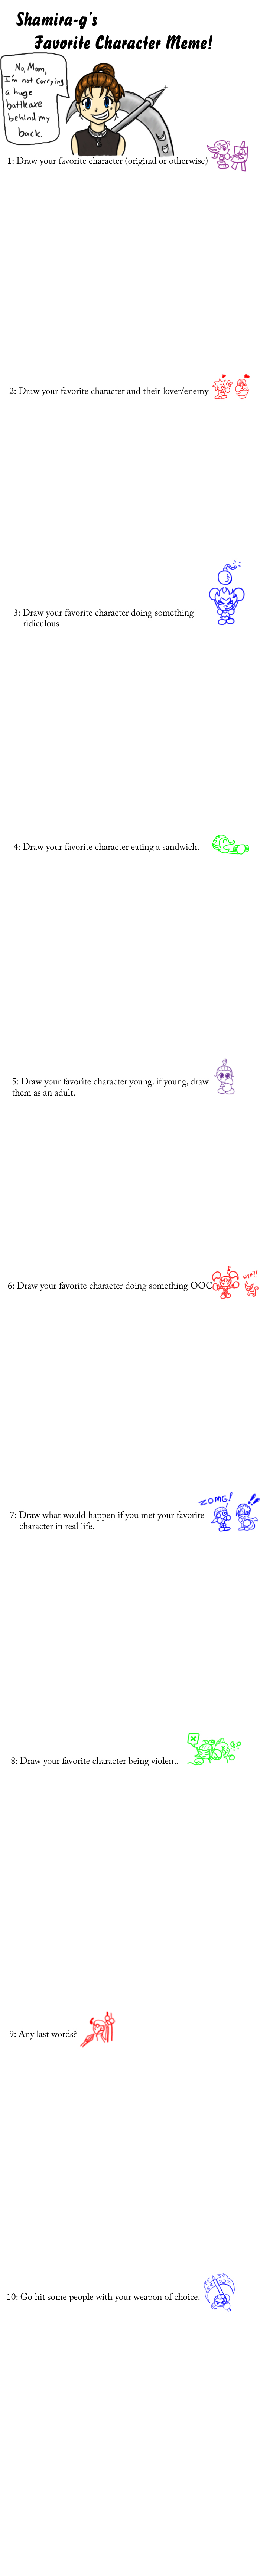 favorite character meme by shamira-g